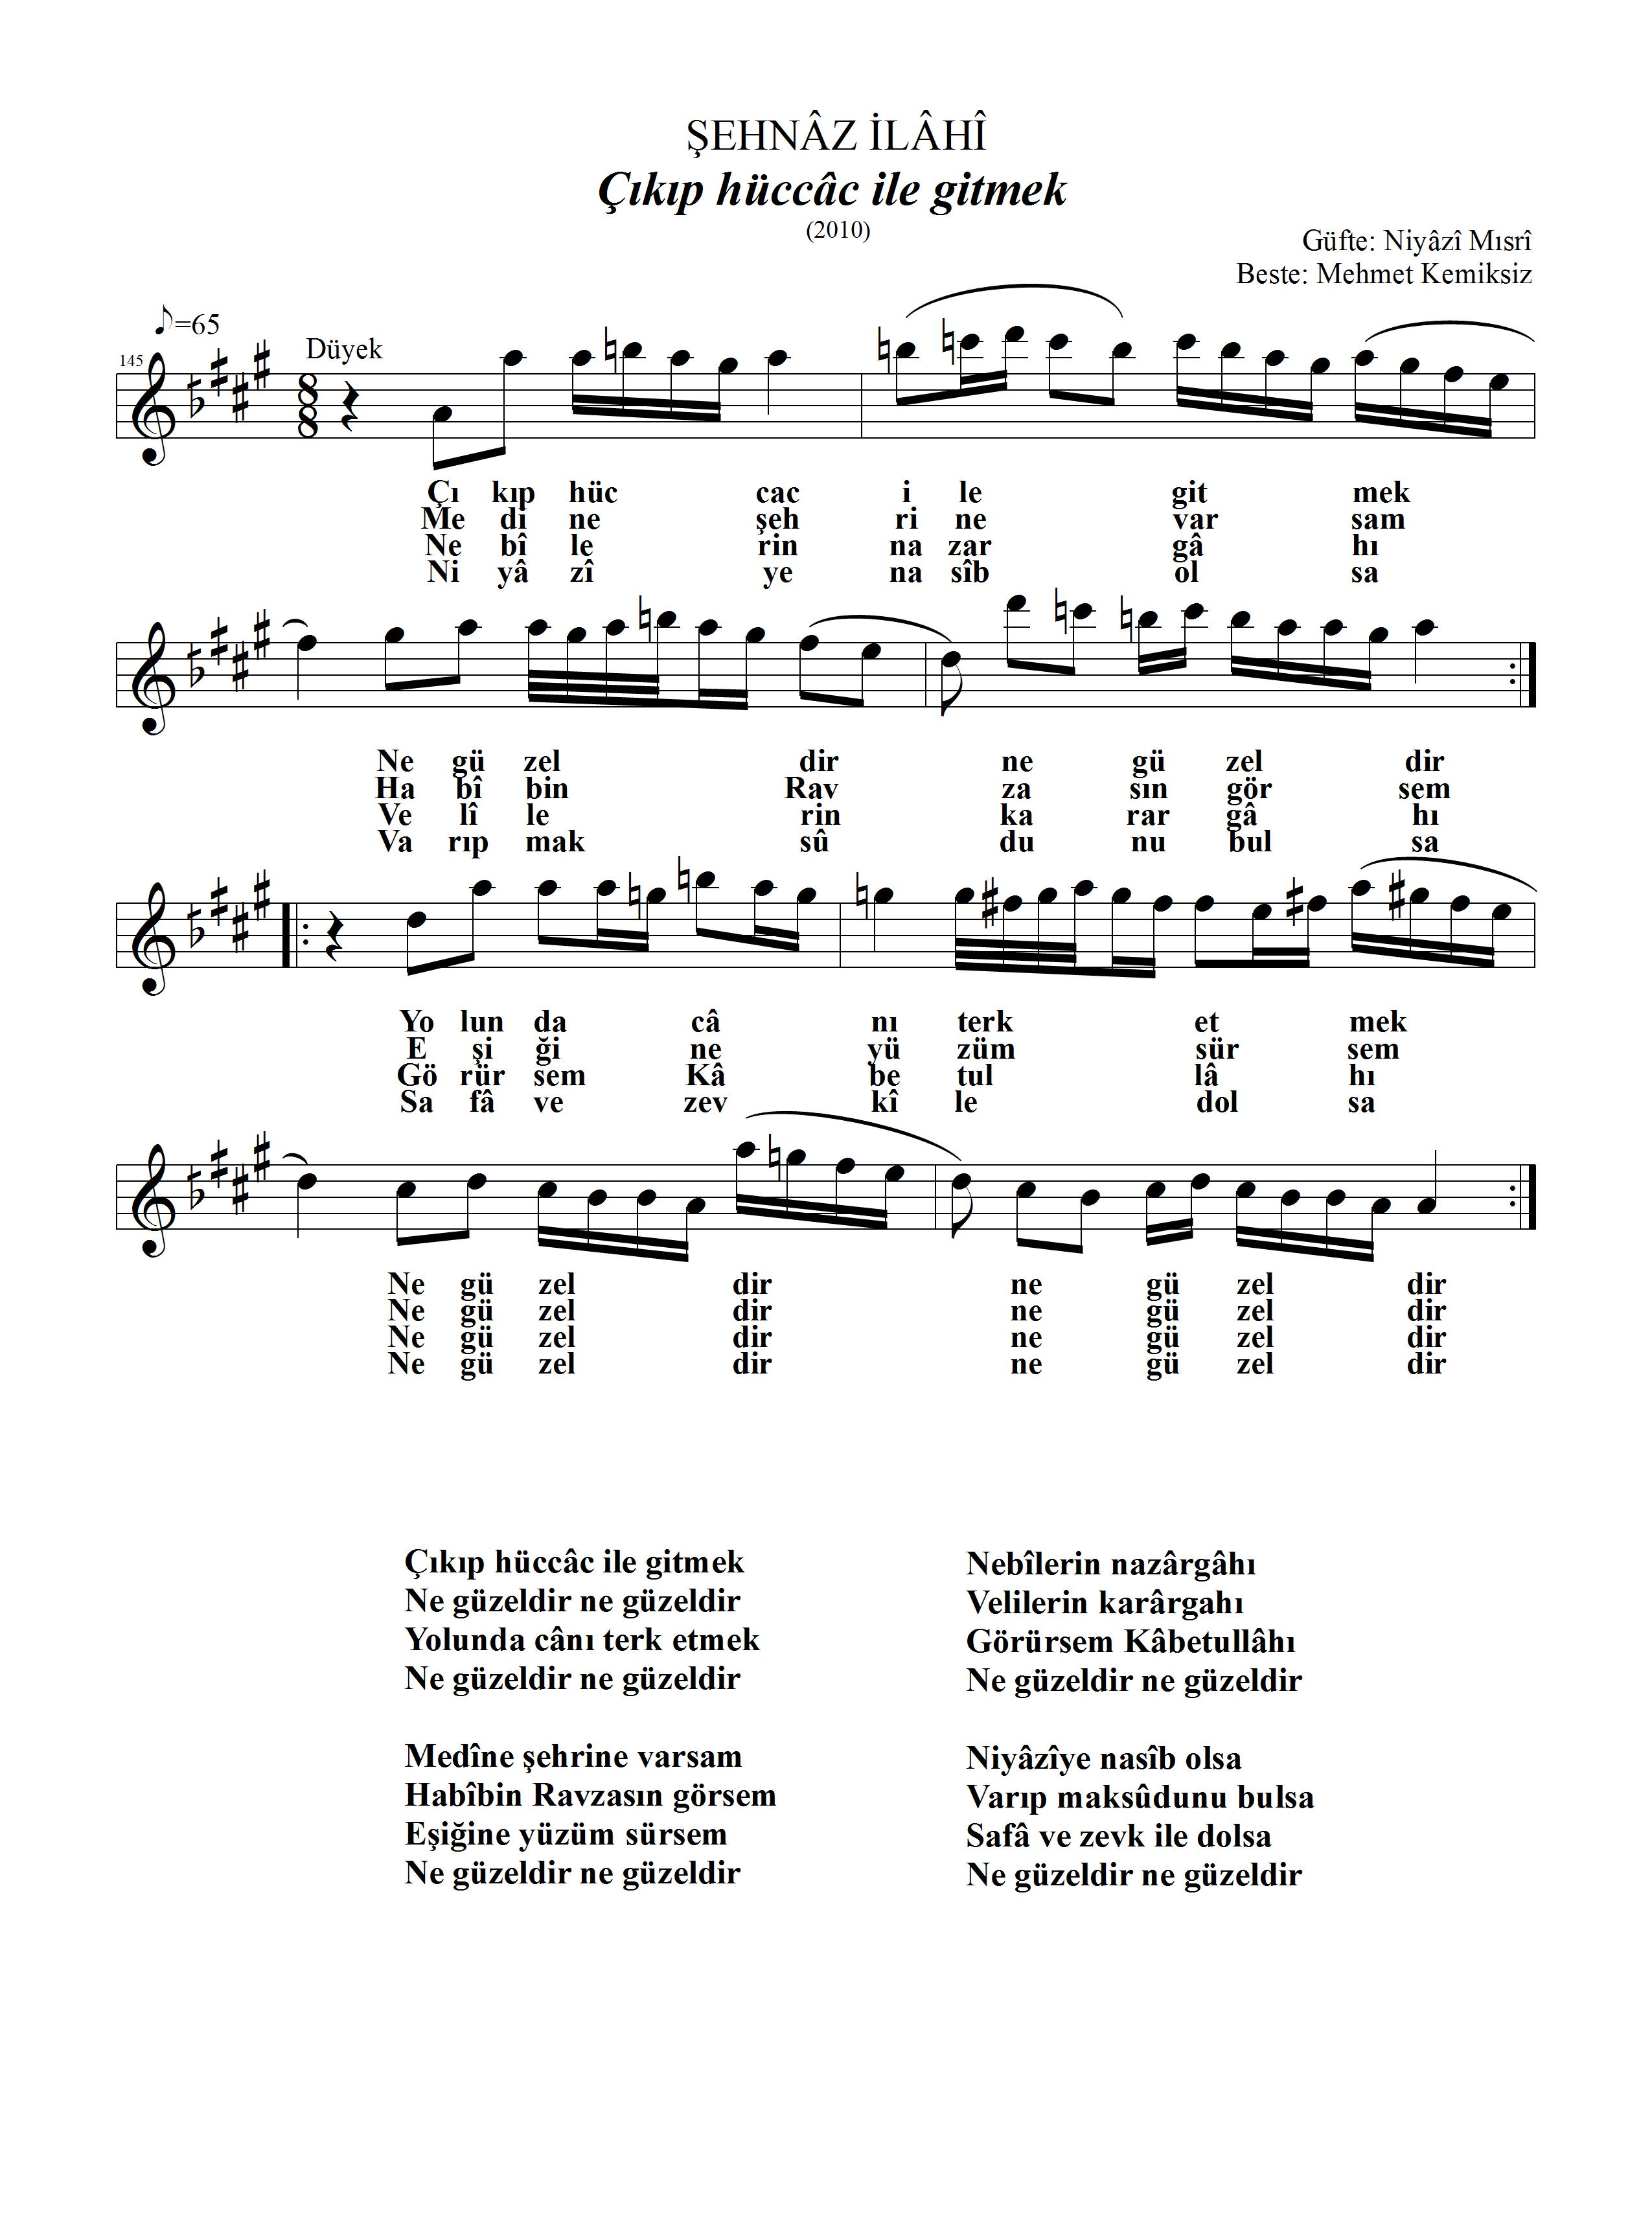 145-Sehnaz-CikipHuccac